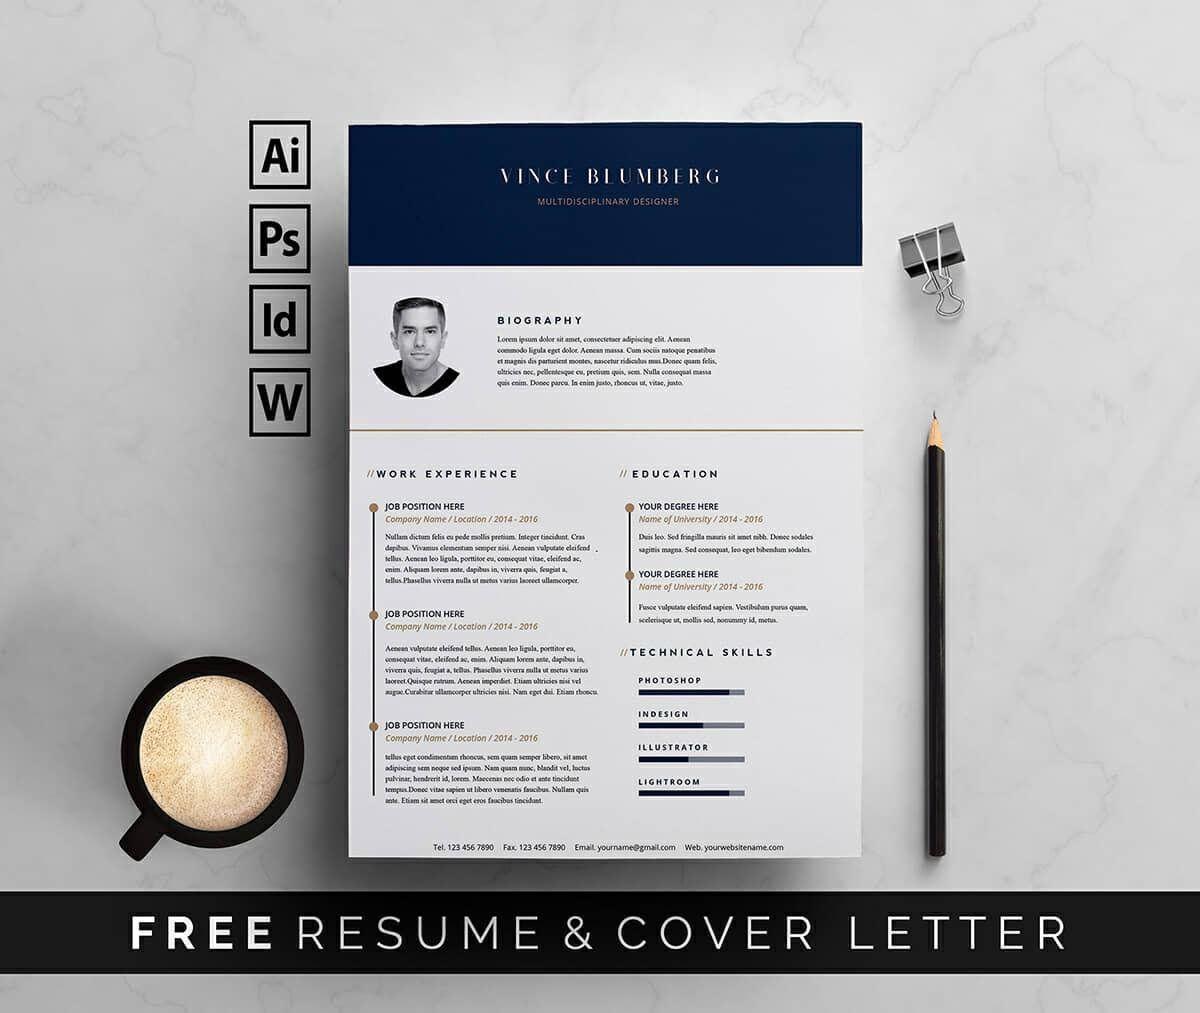 009 Phenomenal Download Free Resume Template Word 2018 High Def Full